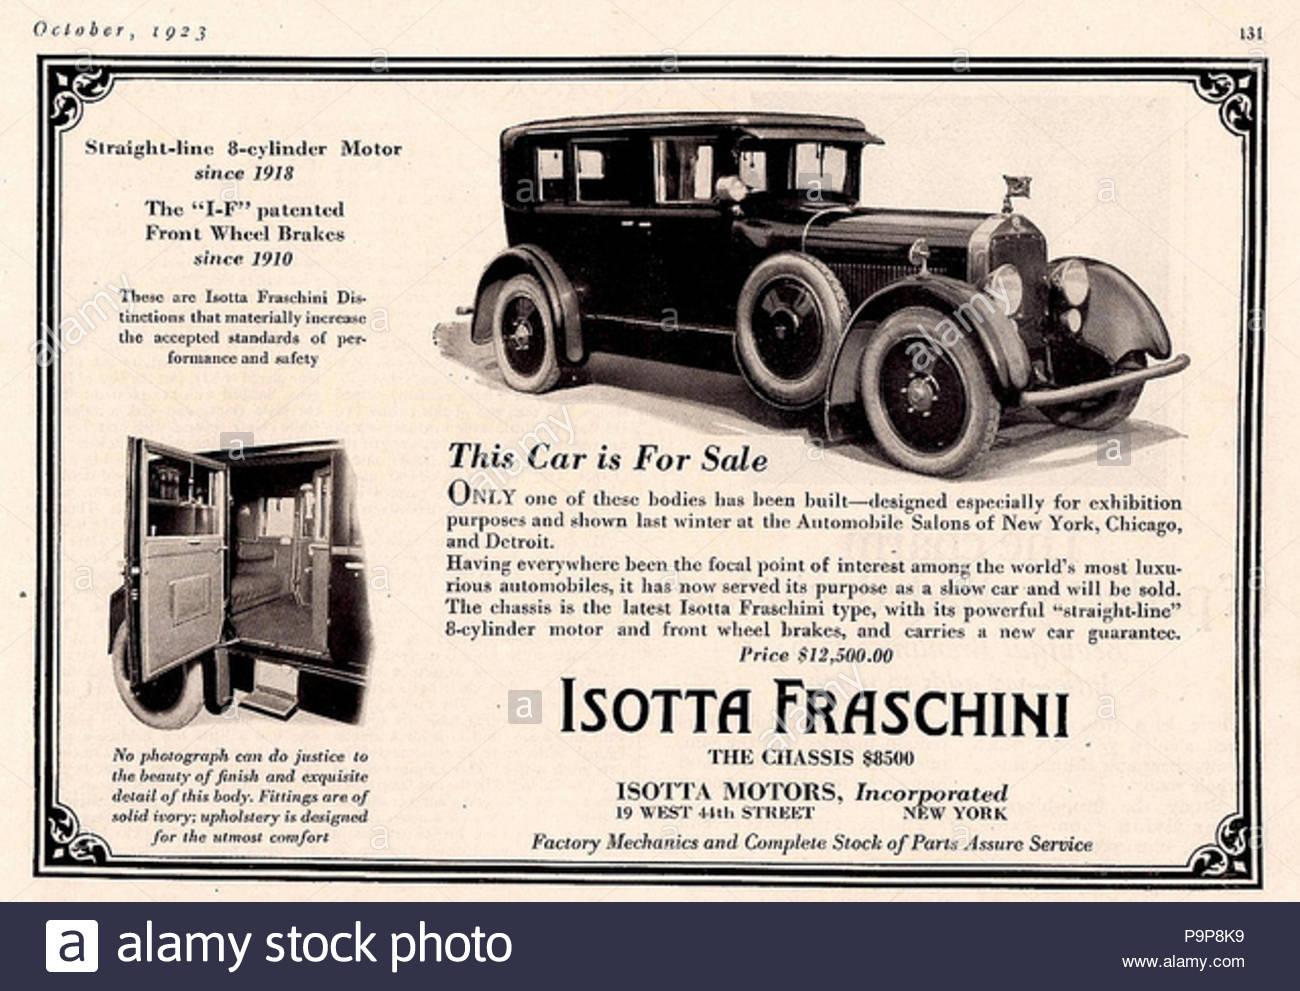 1923-isotta-fraschini-annuncio